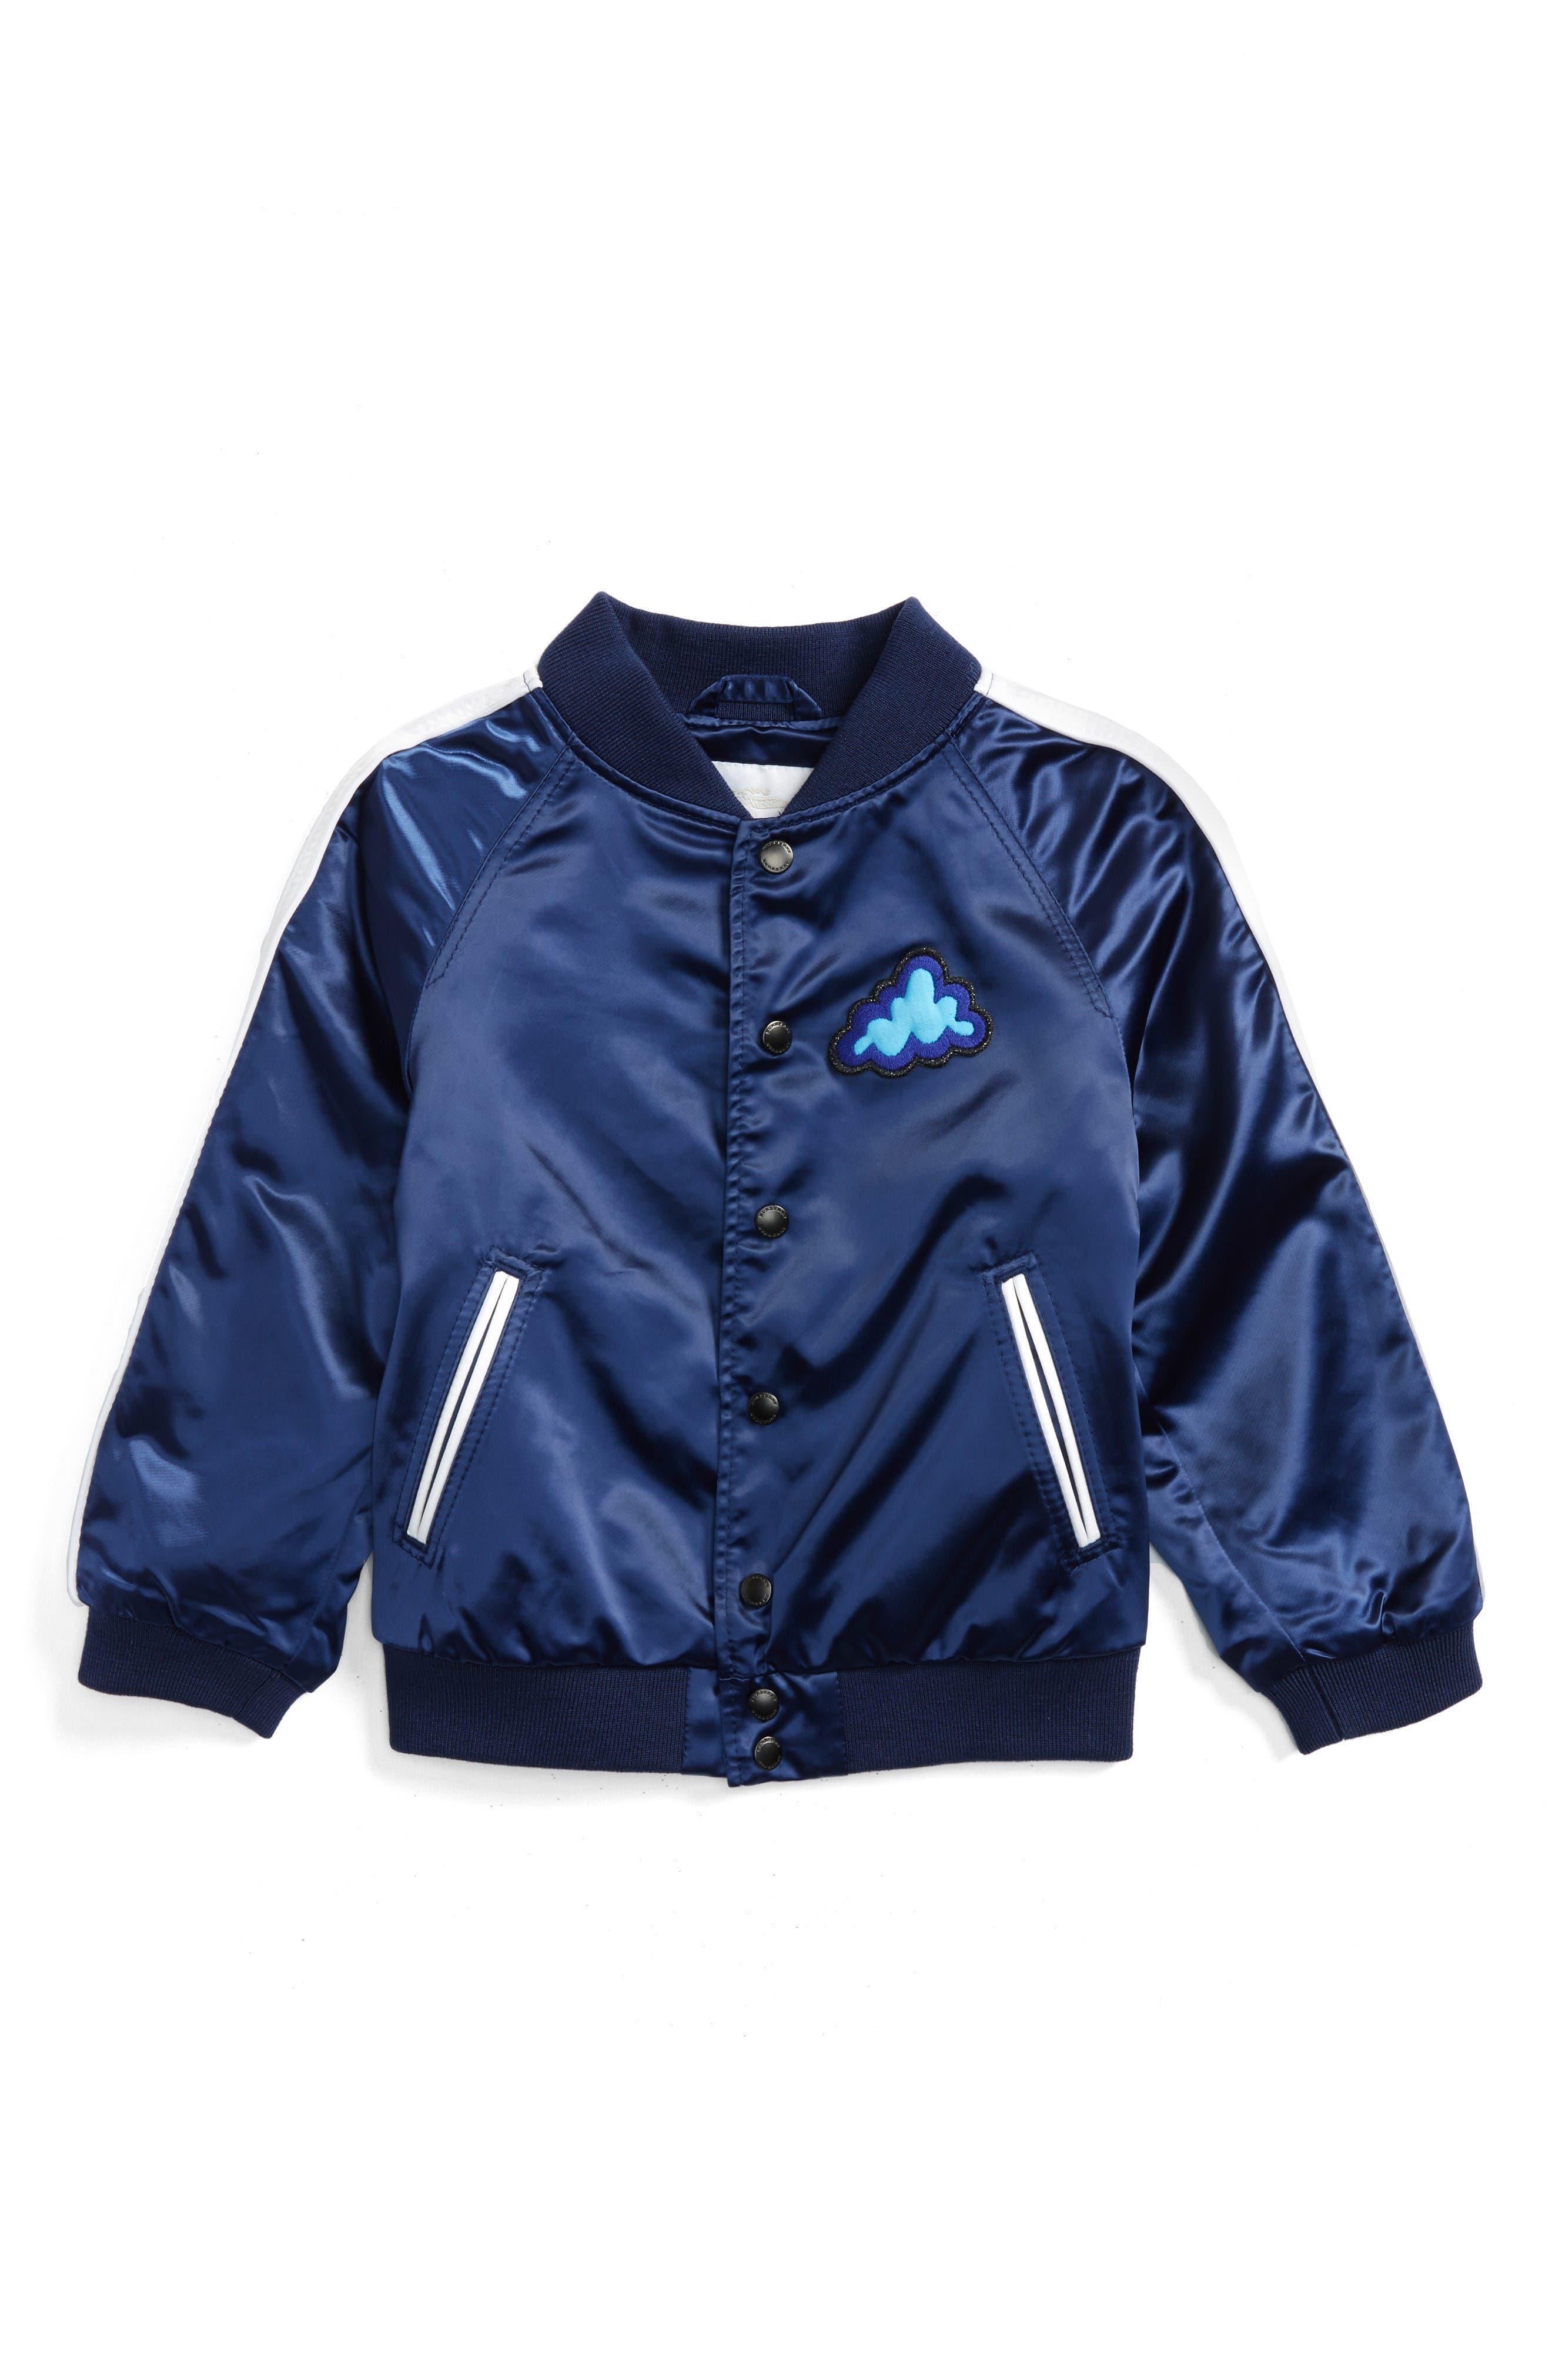 Main Image - Burberry Lidington Weather Appliqué Bomber Jacket (Toddler Boys, Little Boys & Big Boys)